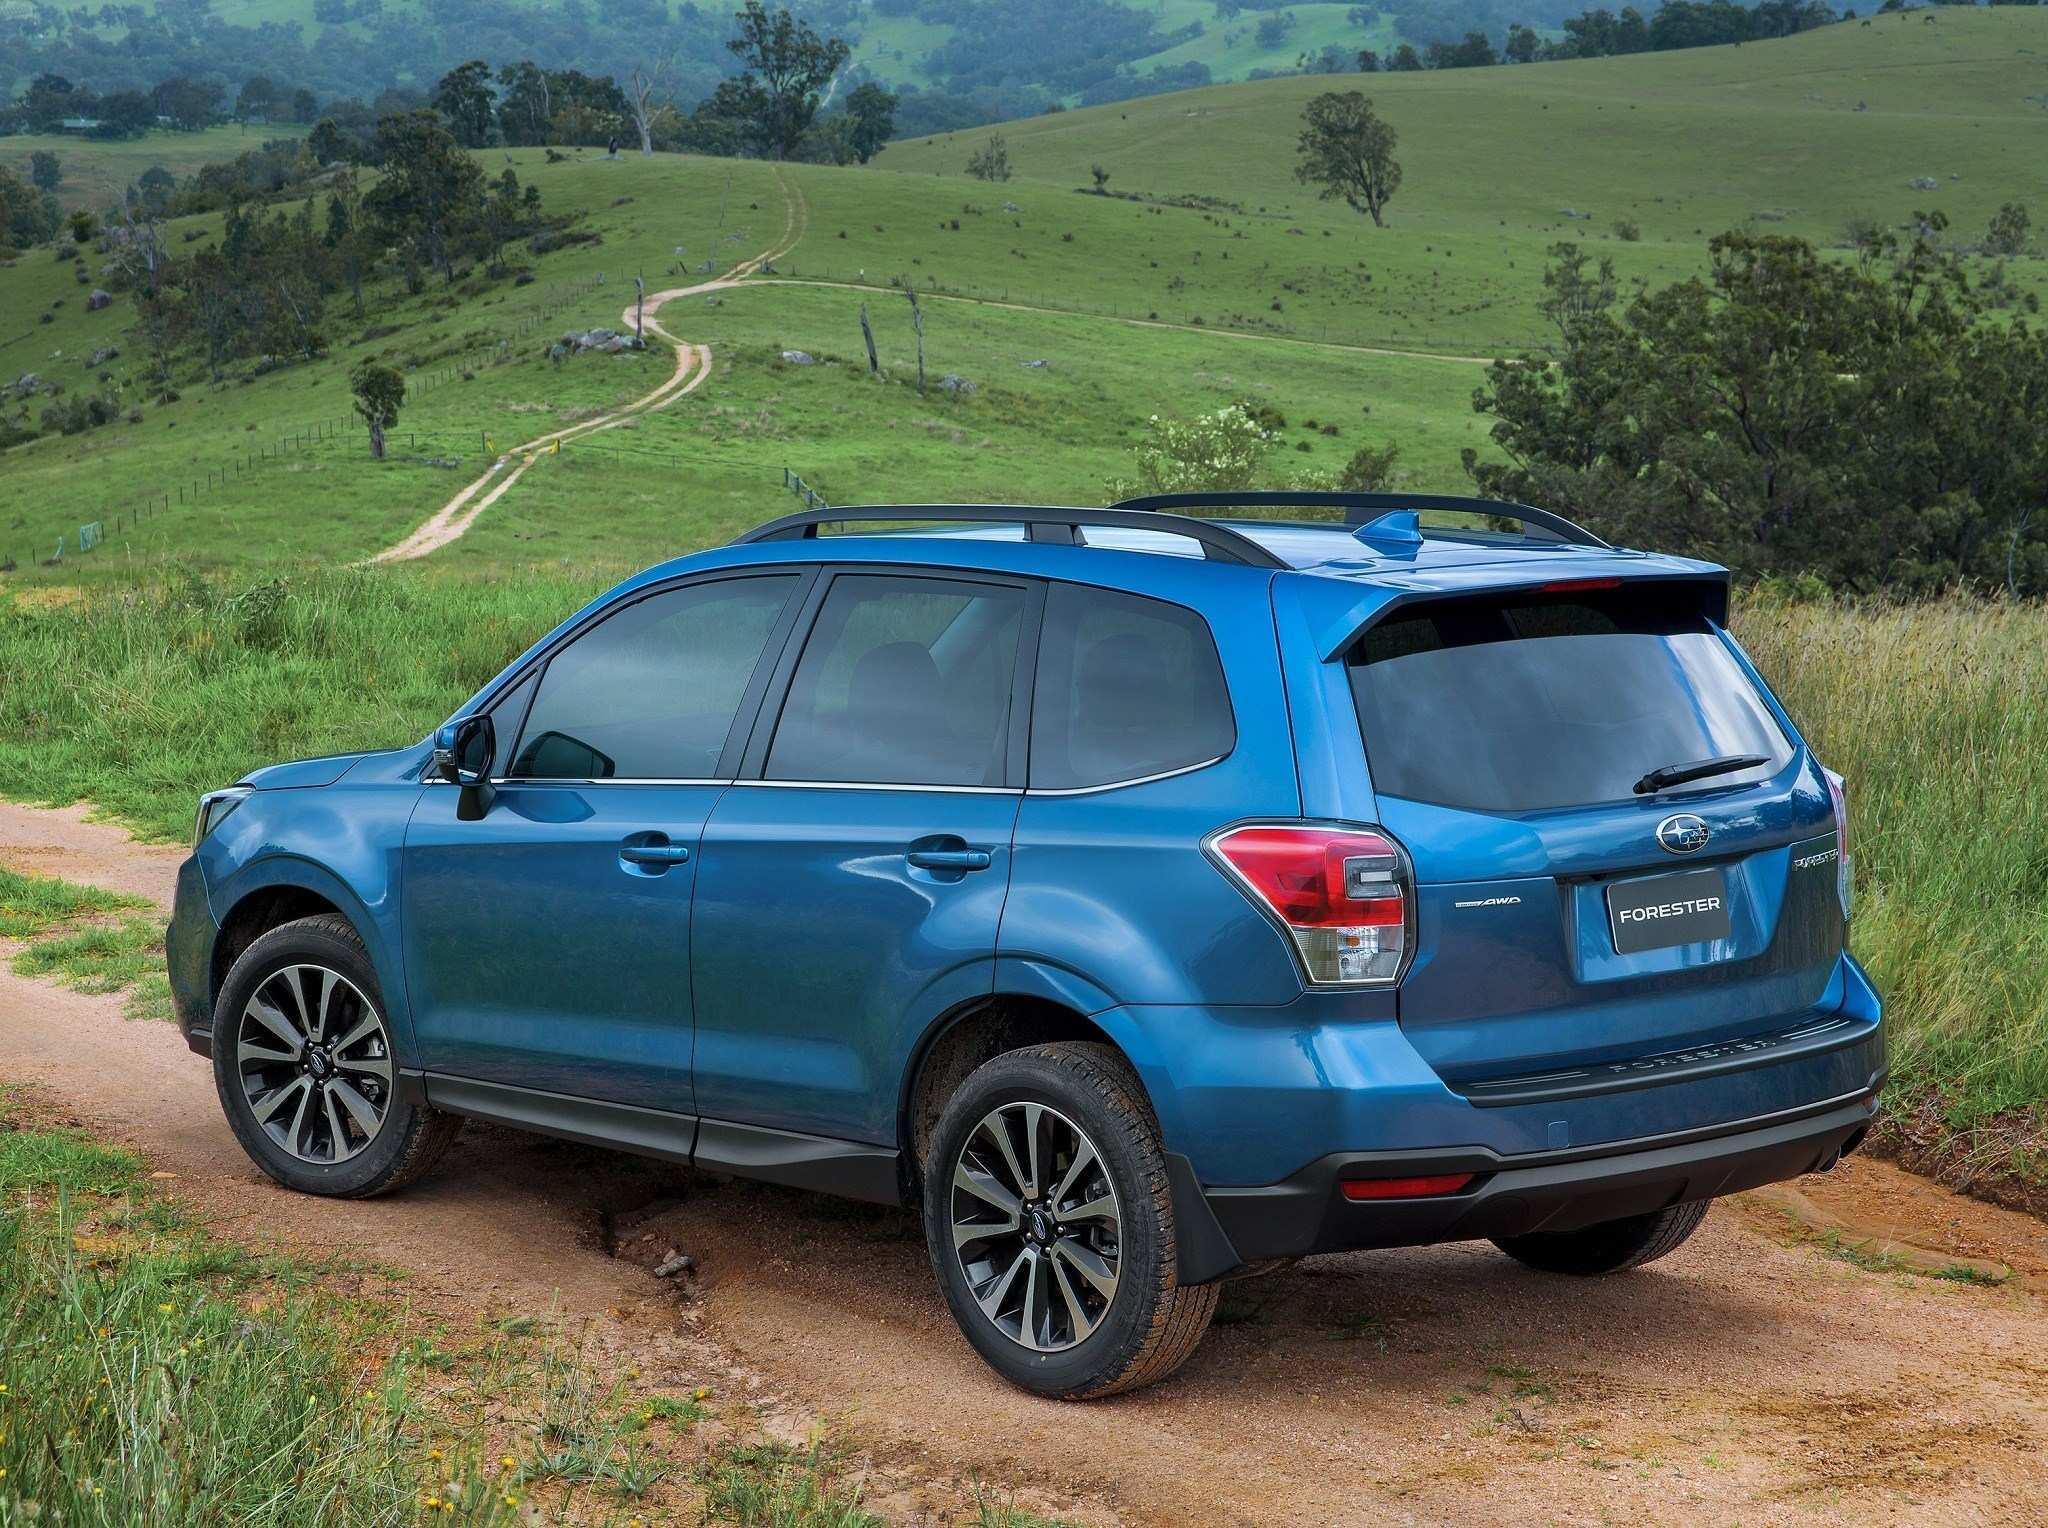 80 Best Review 2020 Subaru Forester Spy Exteriors Concept for 2020 Subaru Forester Spy Exteriors